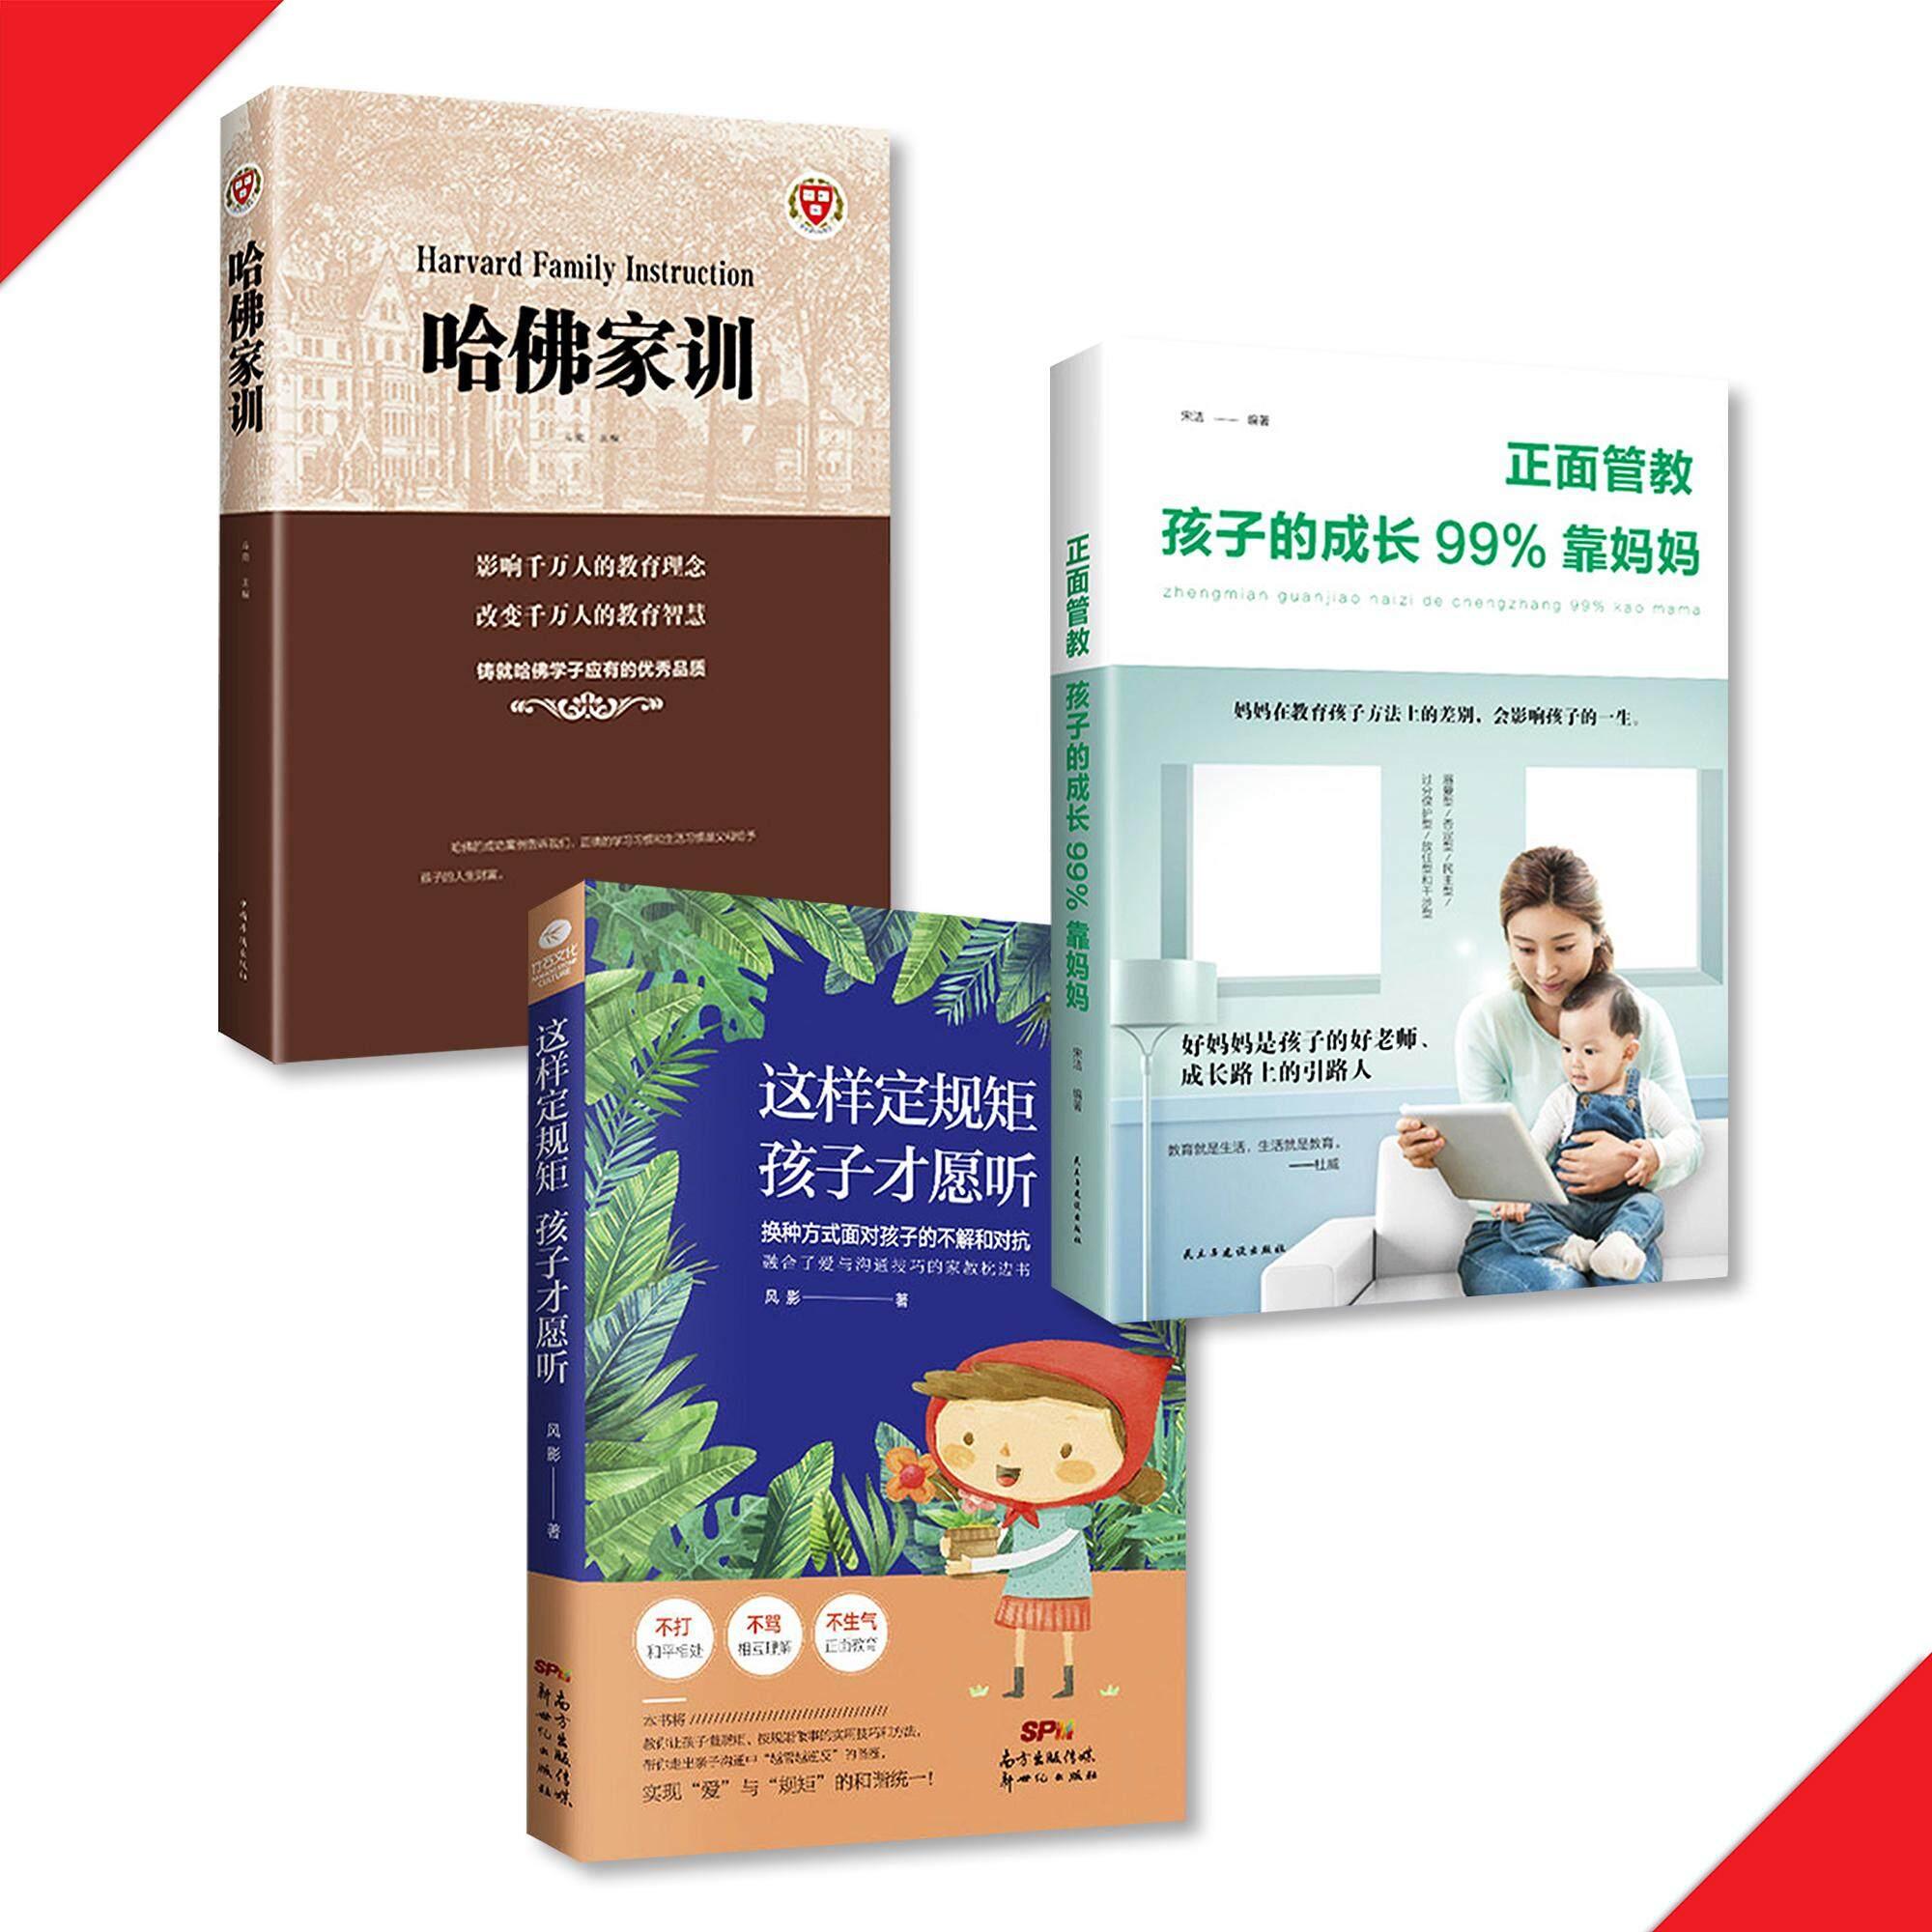 How Parents Can Raise a Good Child 3 Books_Series 6 (哈佛家训+这样定规矩孩子才愿听+正面管教,孩子的成长99%靠妈妈)